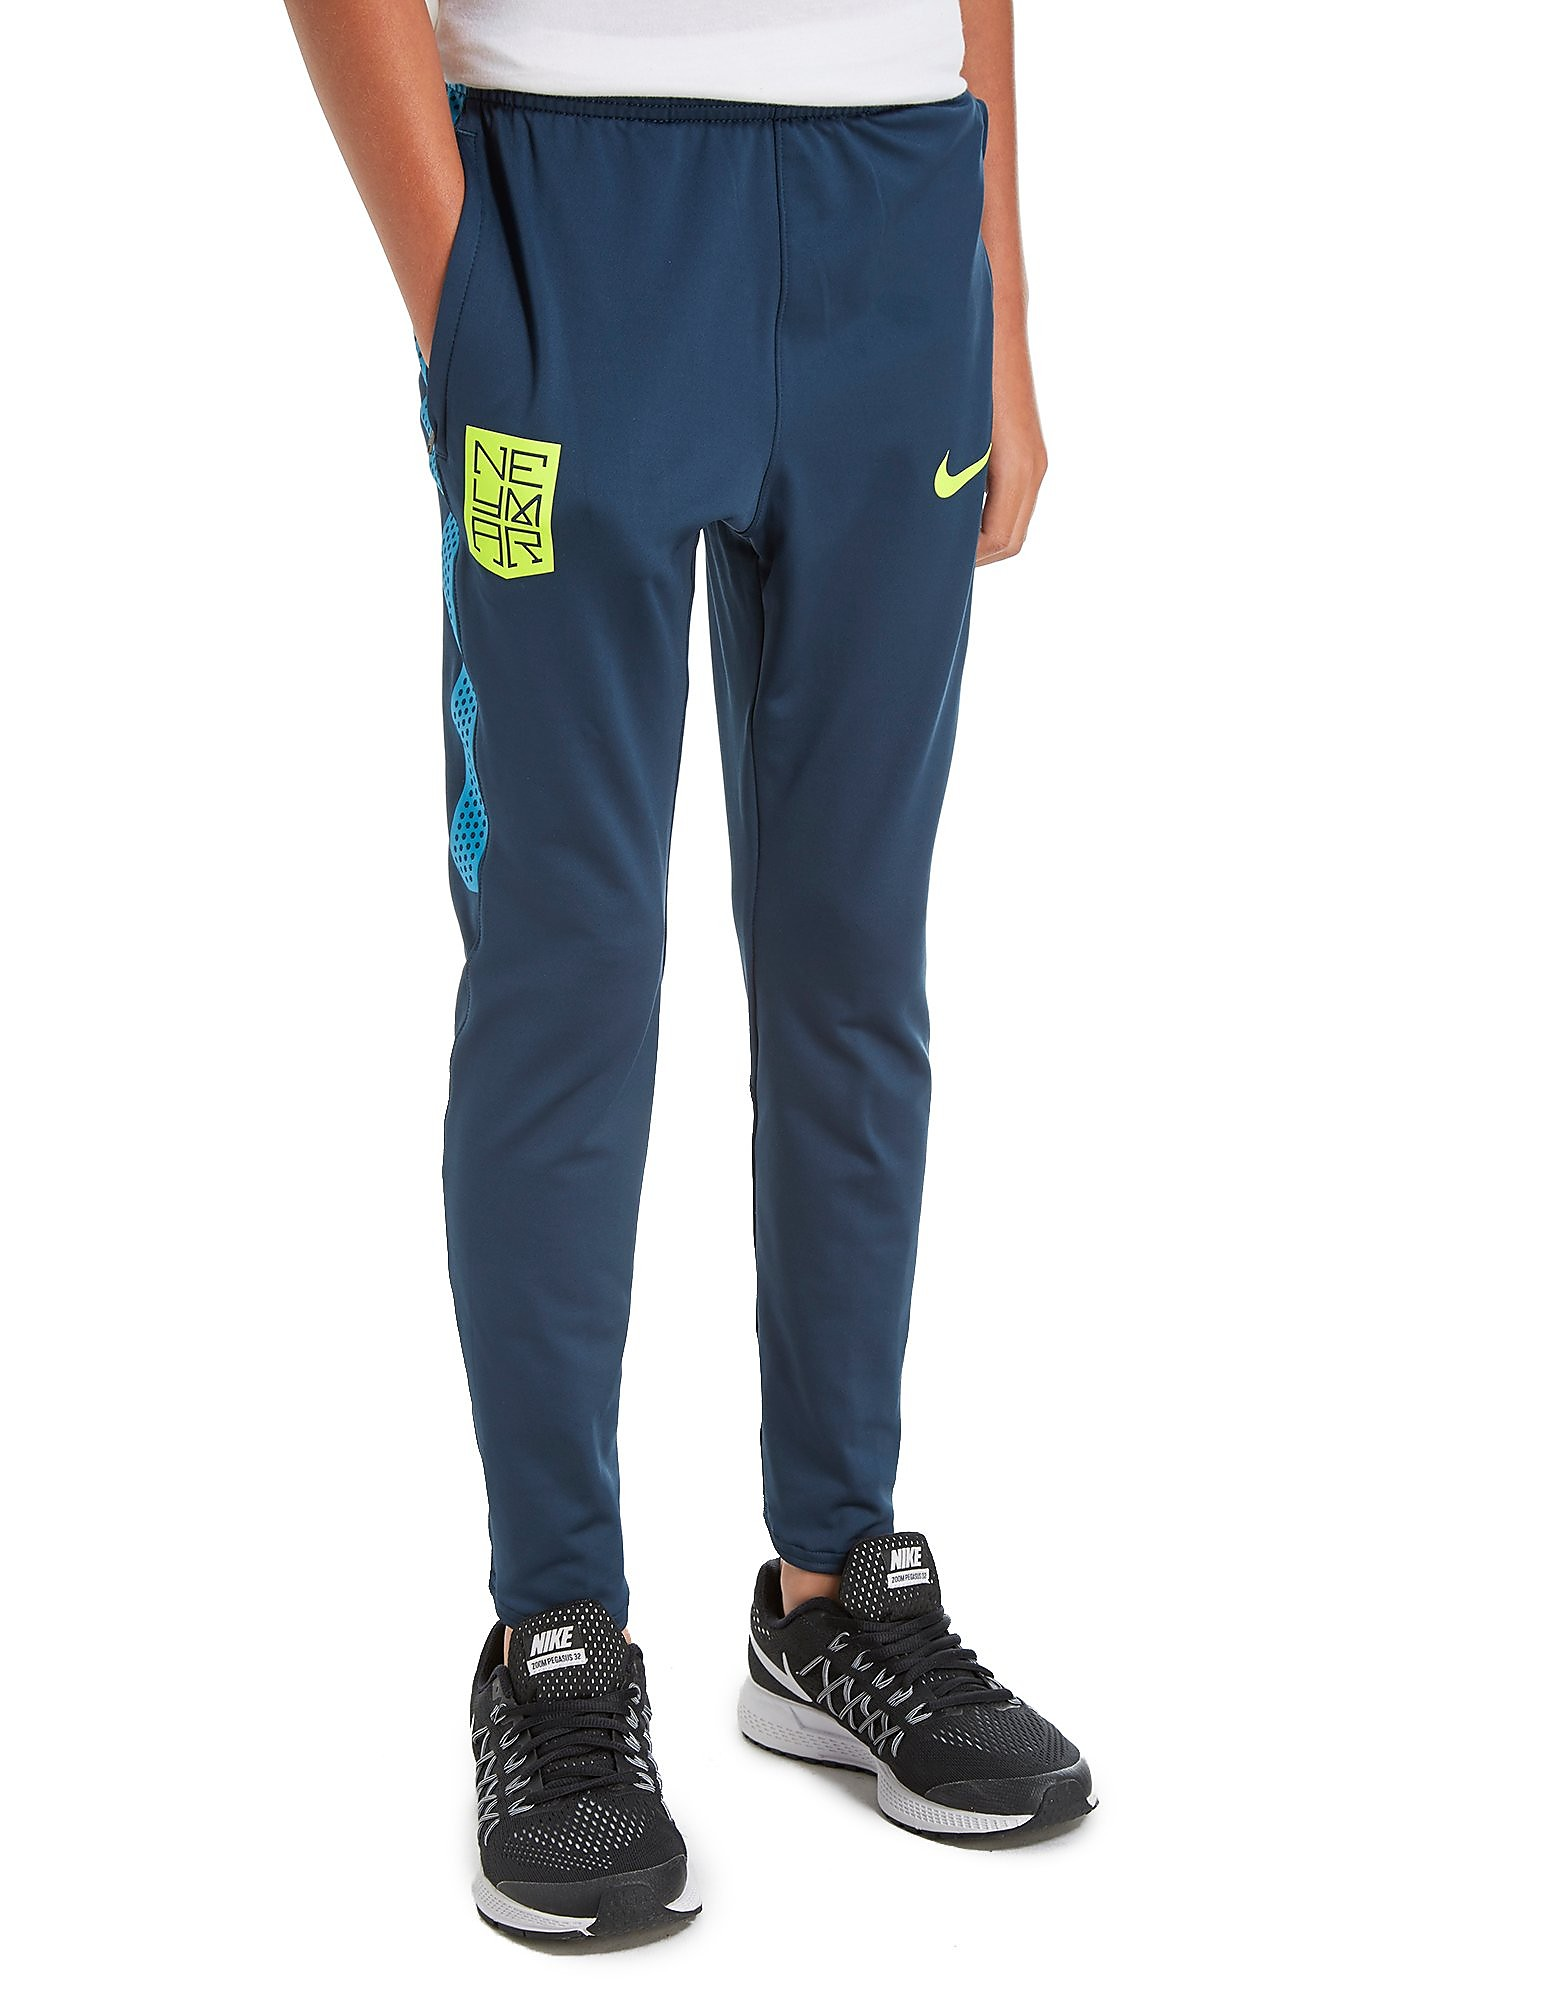 Nike Neymar Track Pants Junior